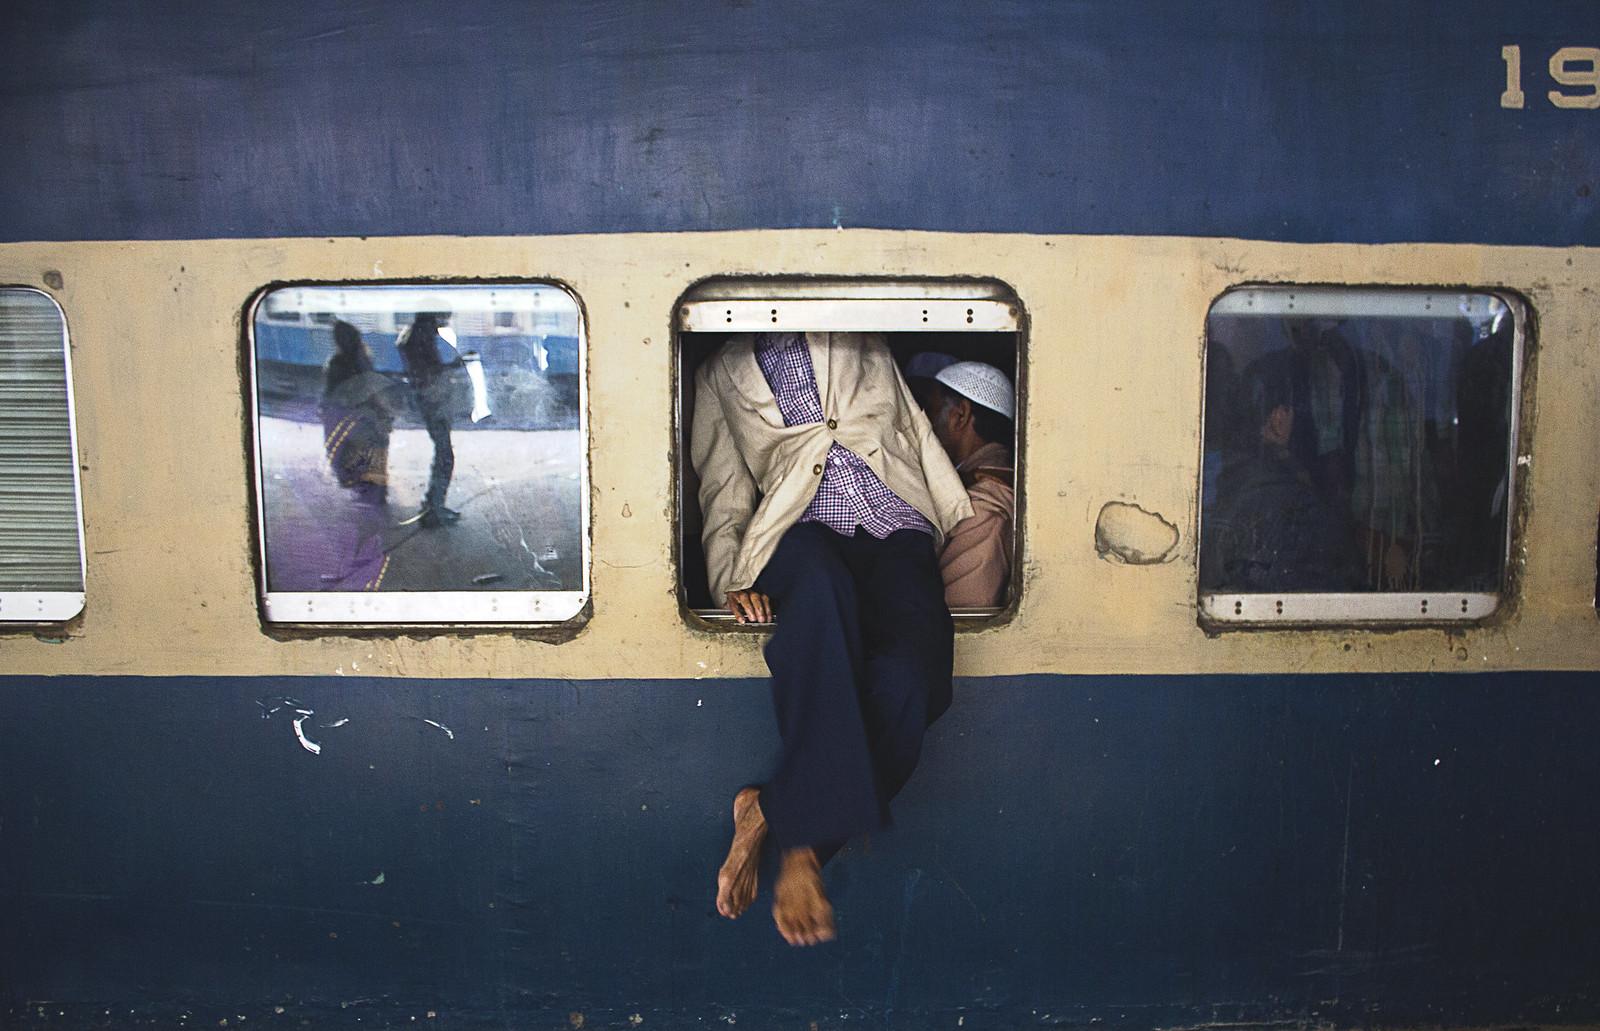 Hanging Passenger | by kazimushfiq